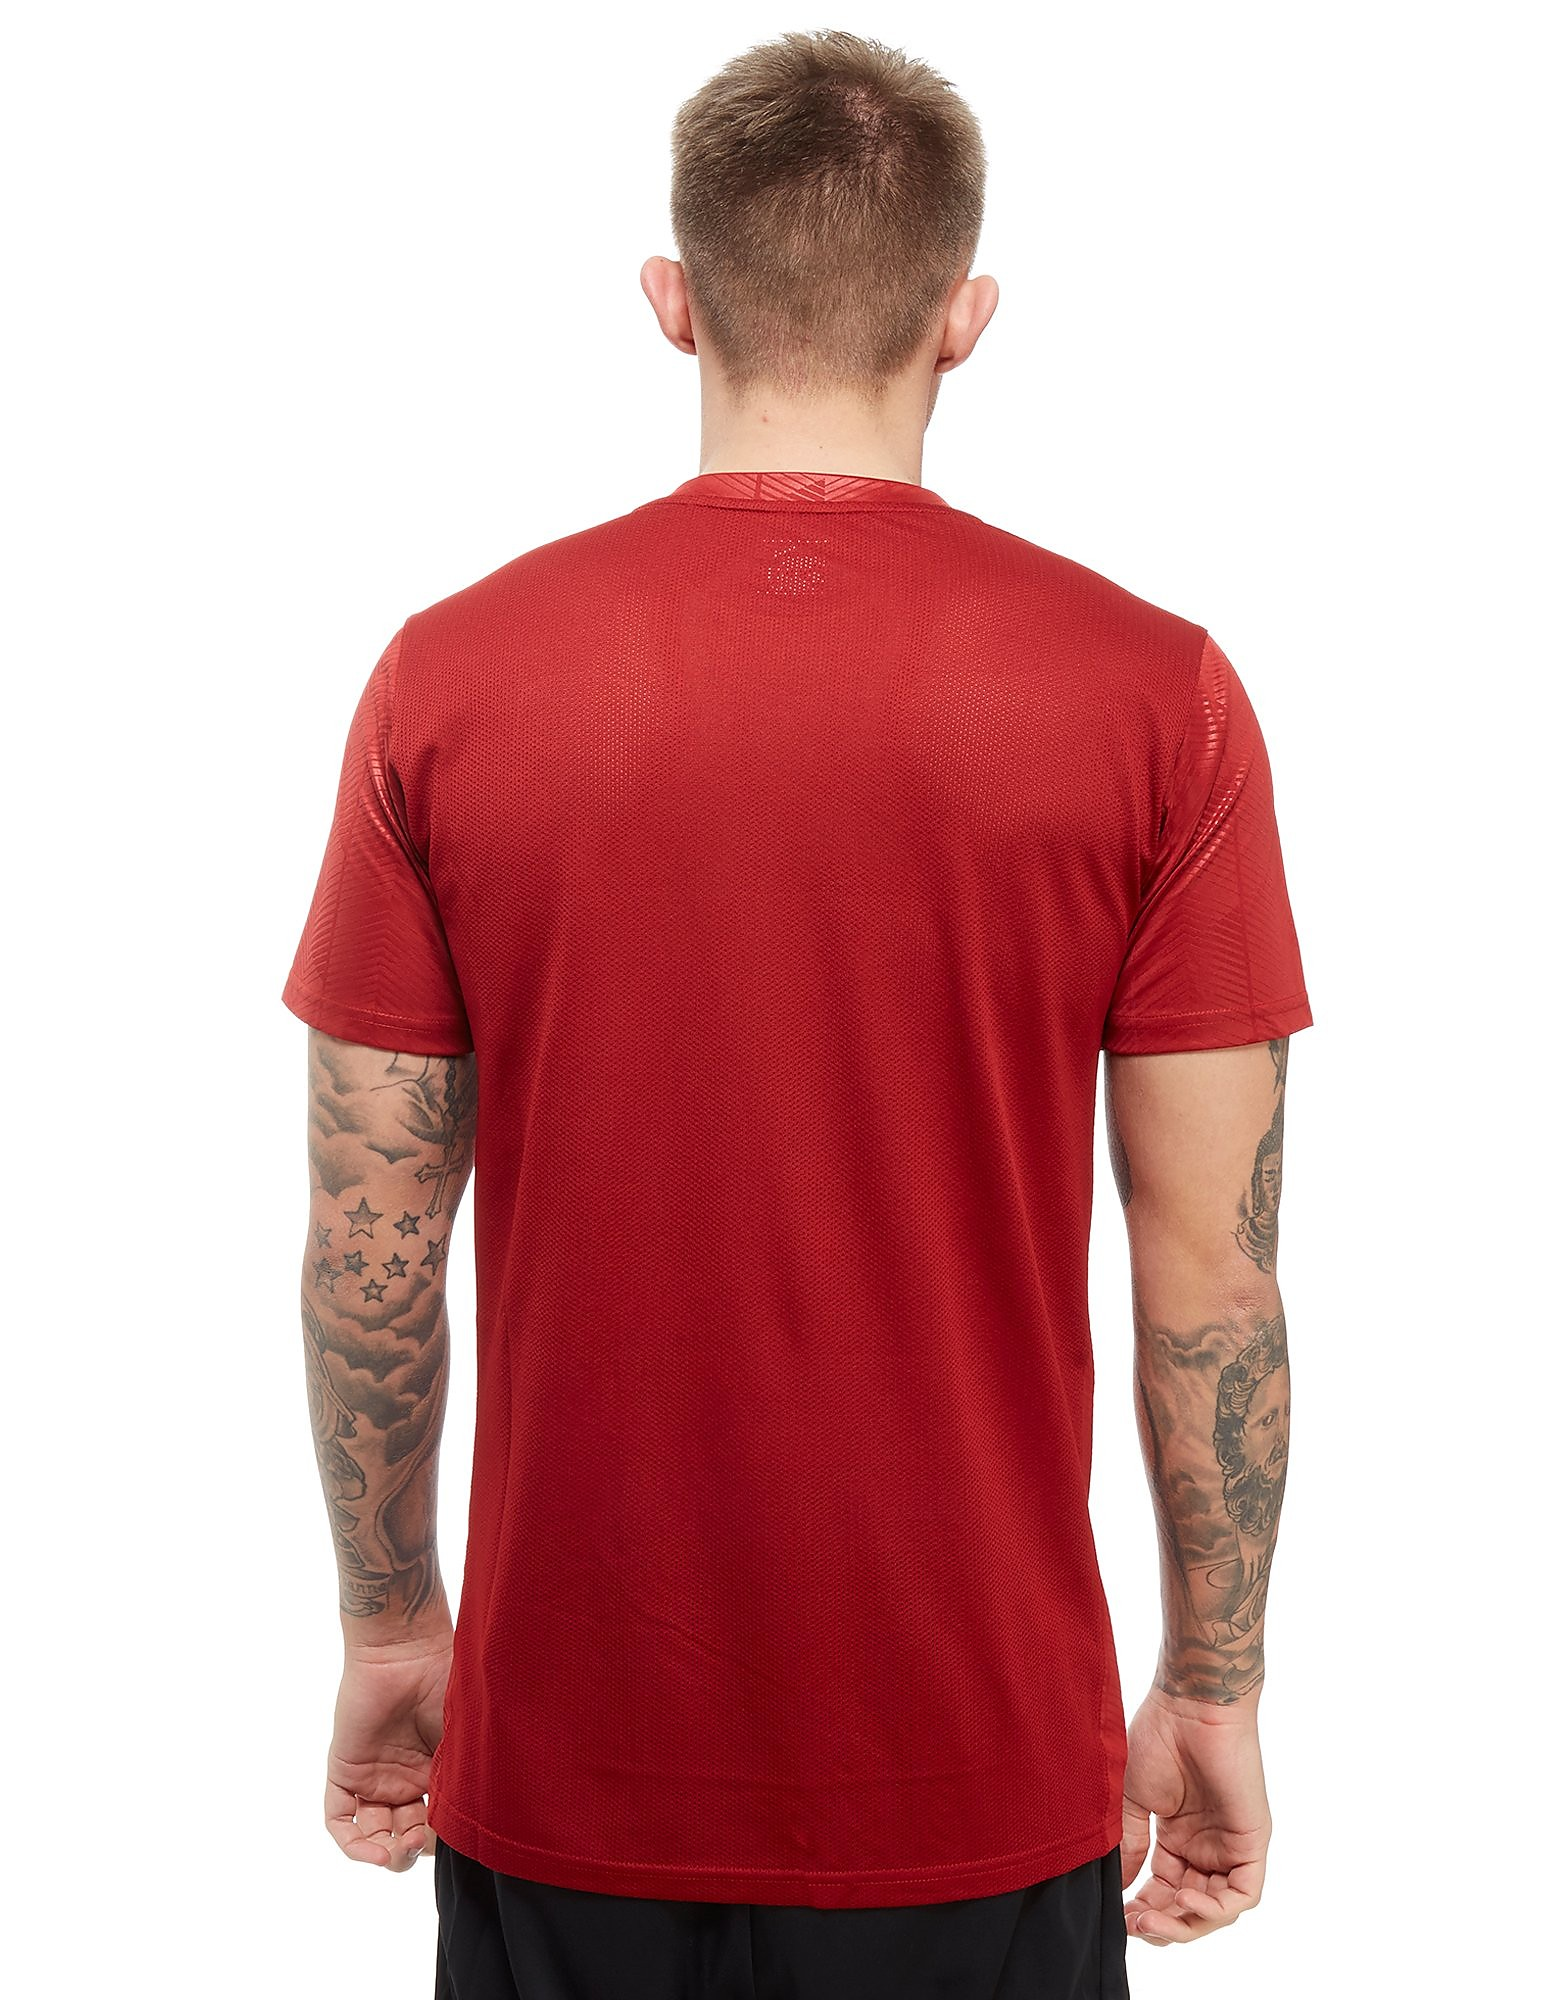 PUMA Arsenal FC 2018 Stadium Shirt